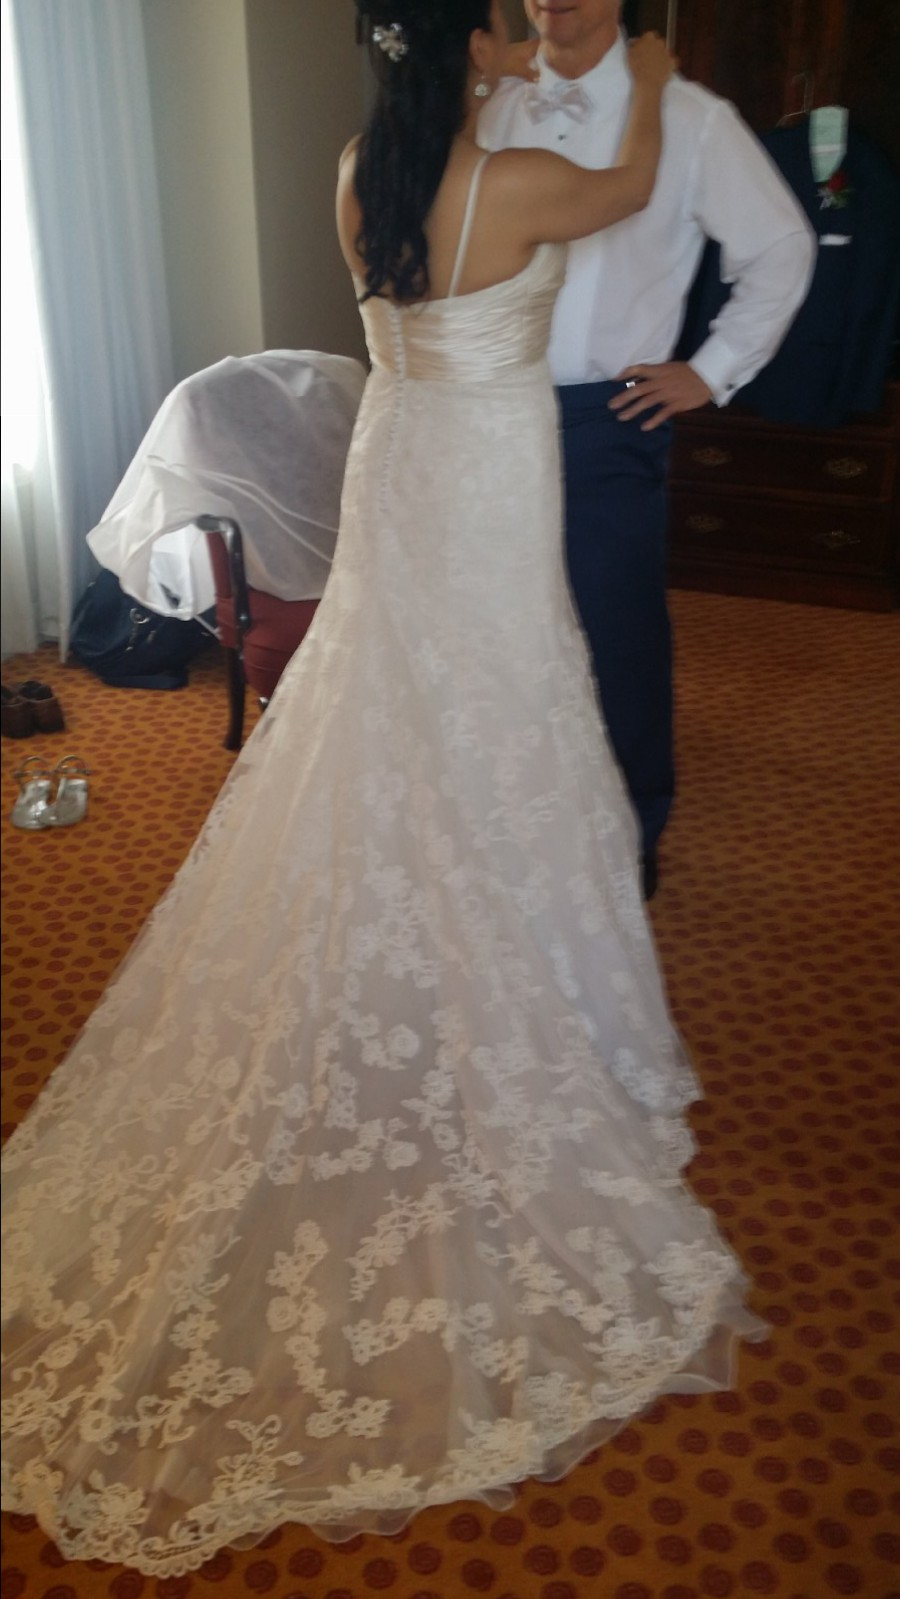 Casablanca cb couture b047 preowned wedding dress on sale for Cb couture wedding dresses